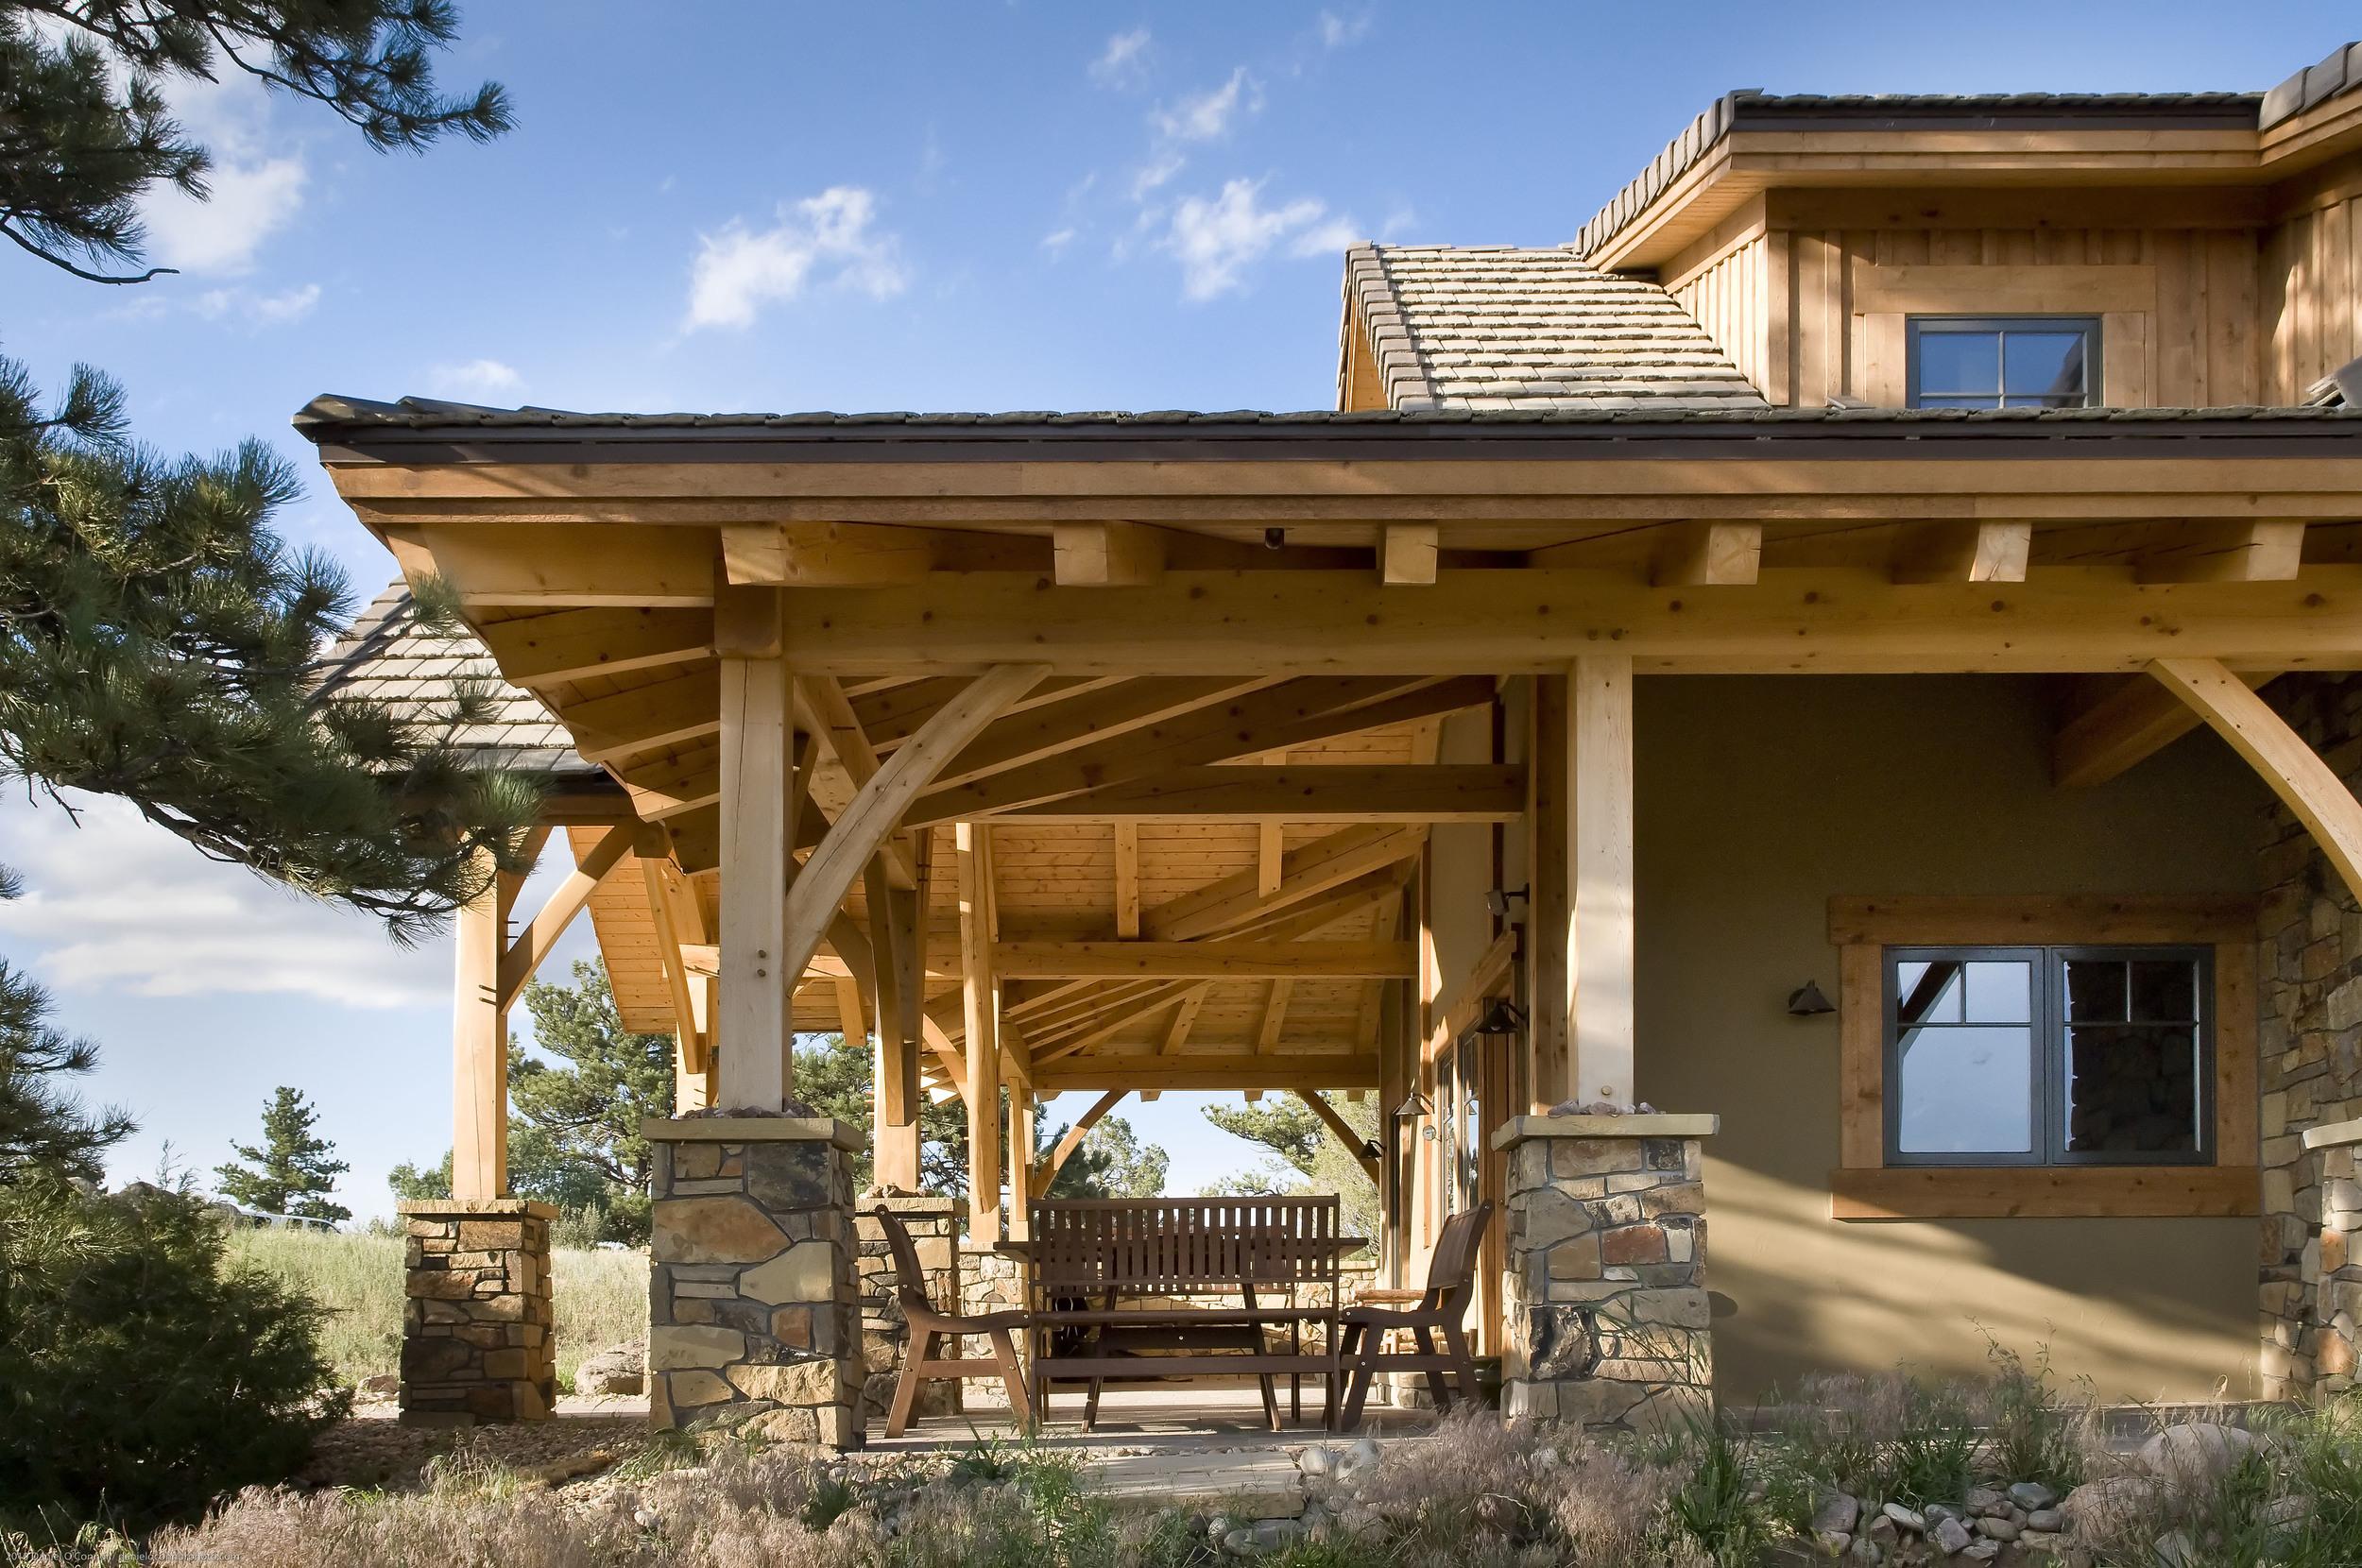 The Carpenter Cabin